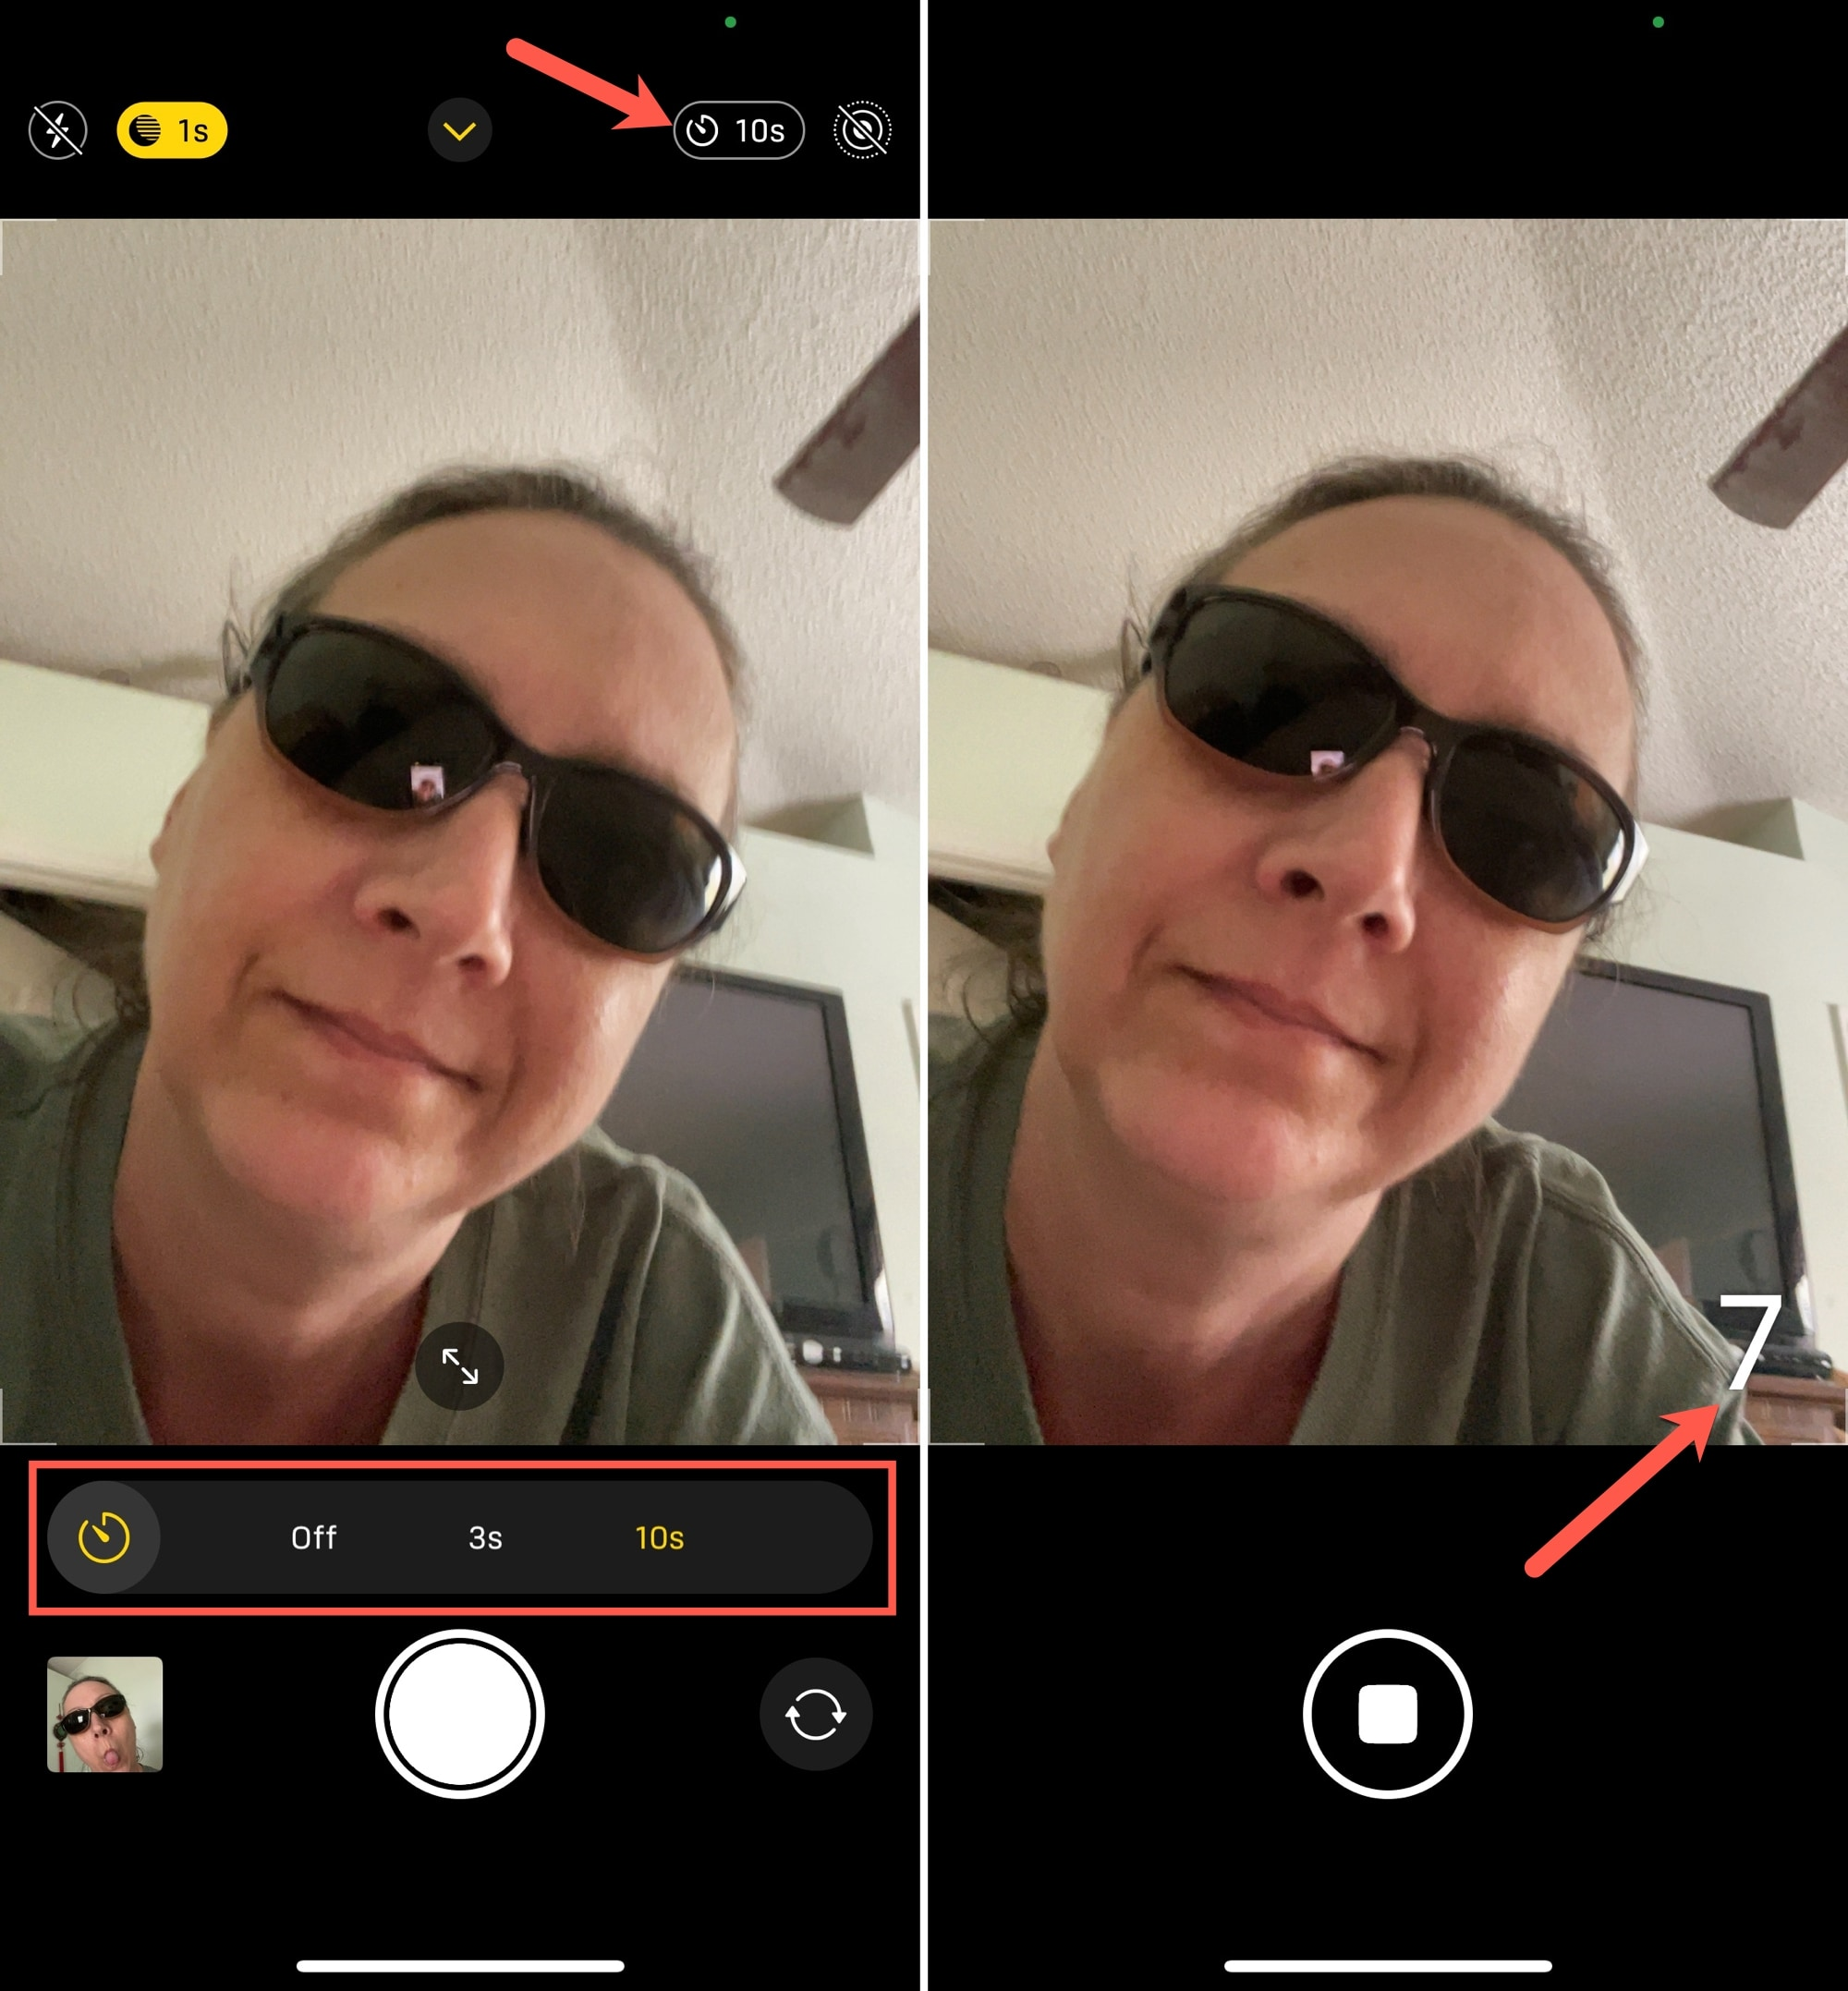 iPhone Selfie Timer